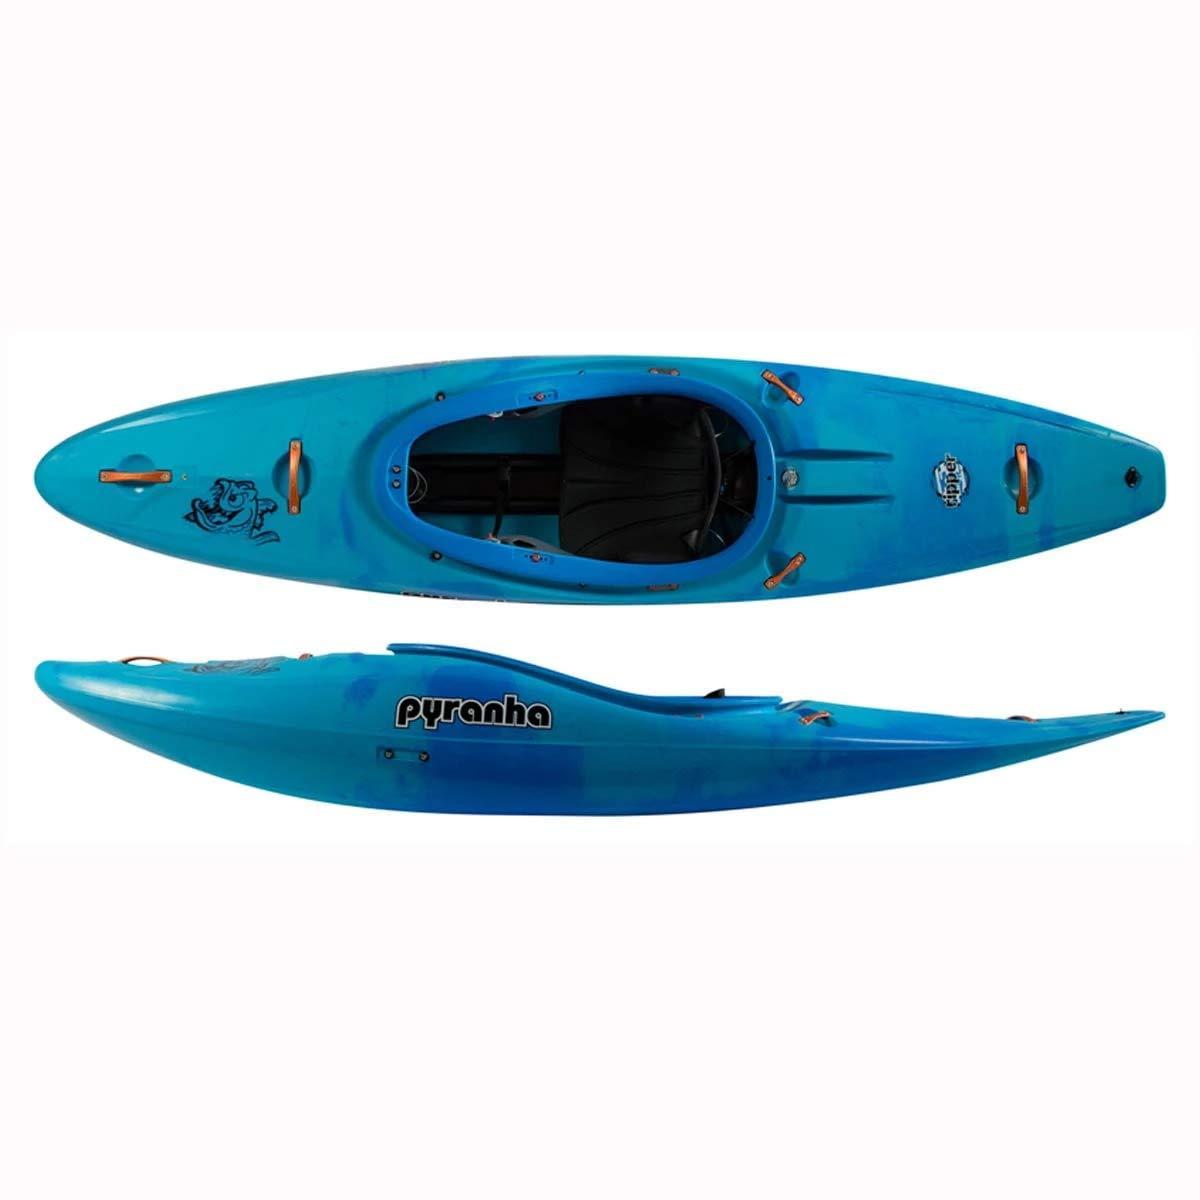 PYRA Pyranha Ripper Medium Whitewater Kayak by PYRA